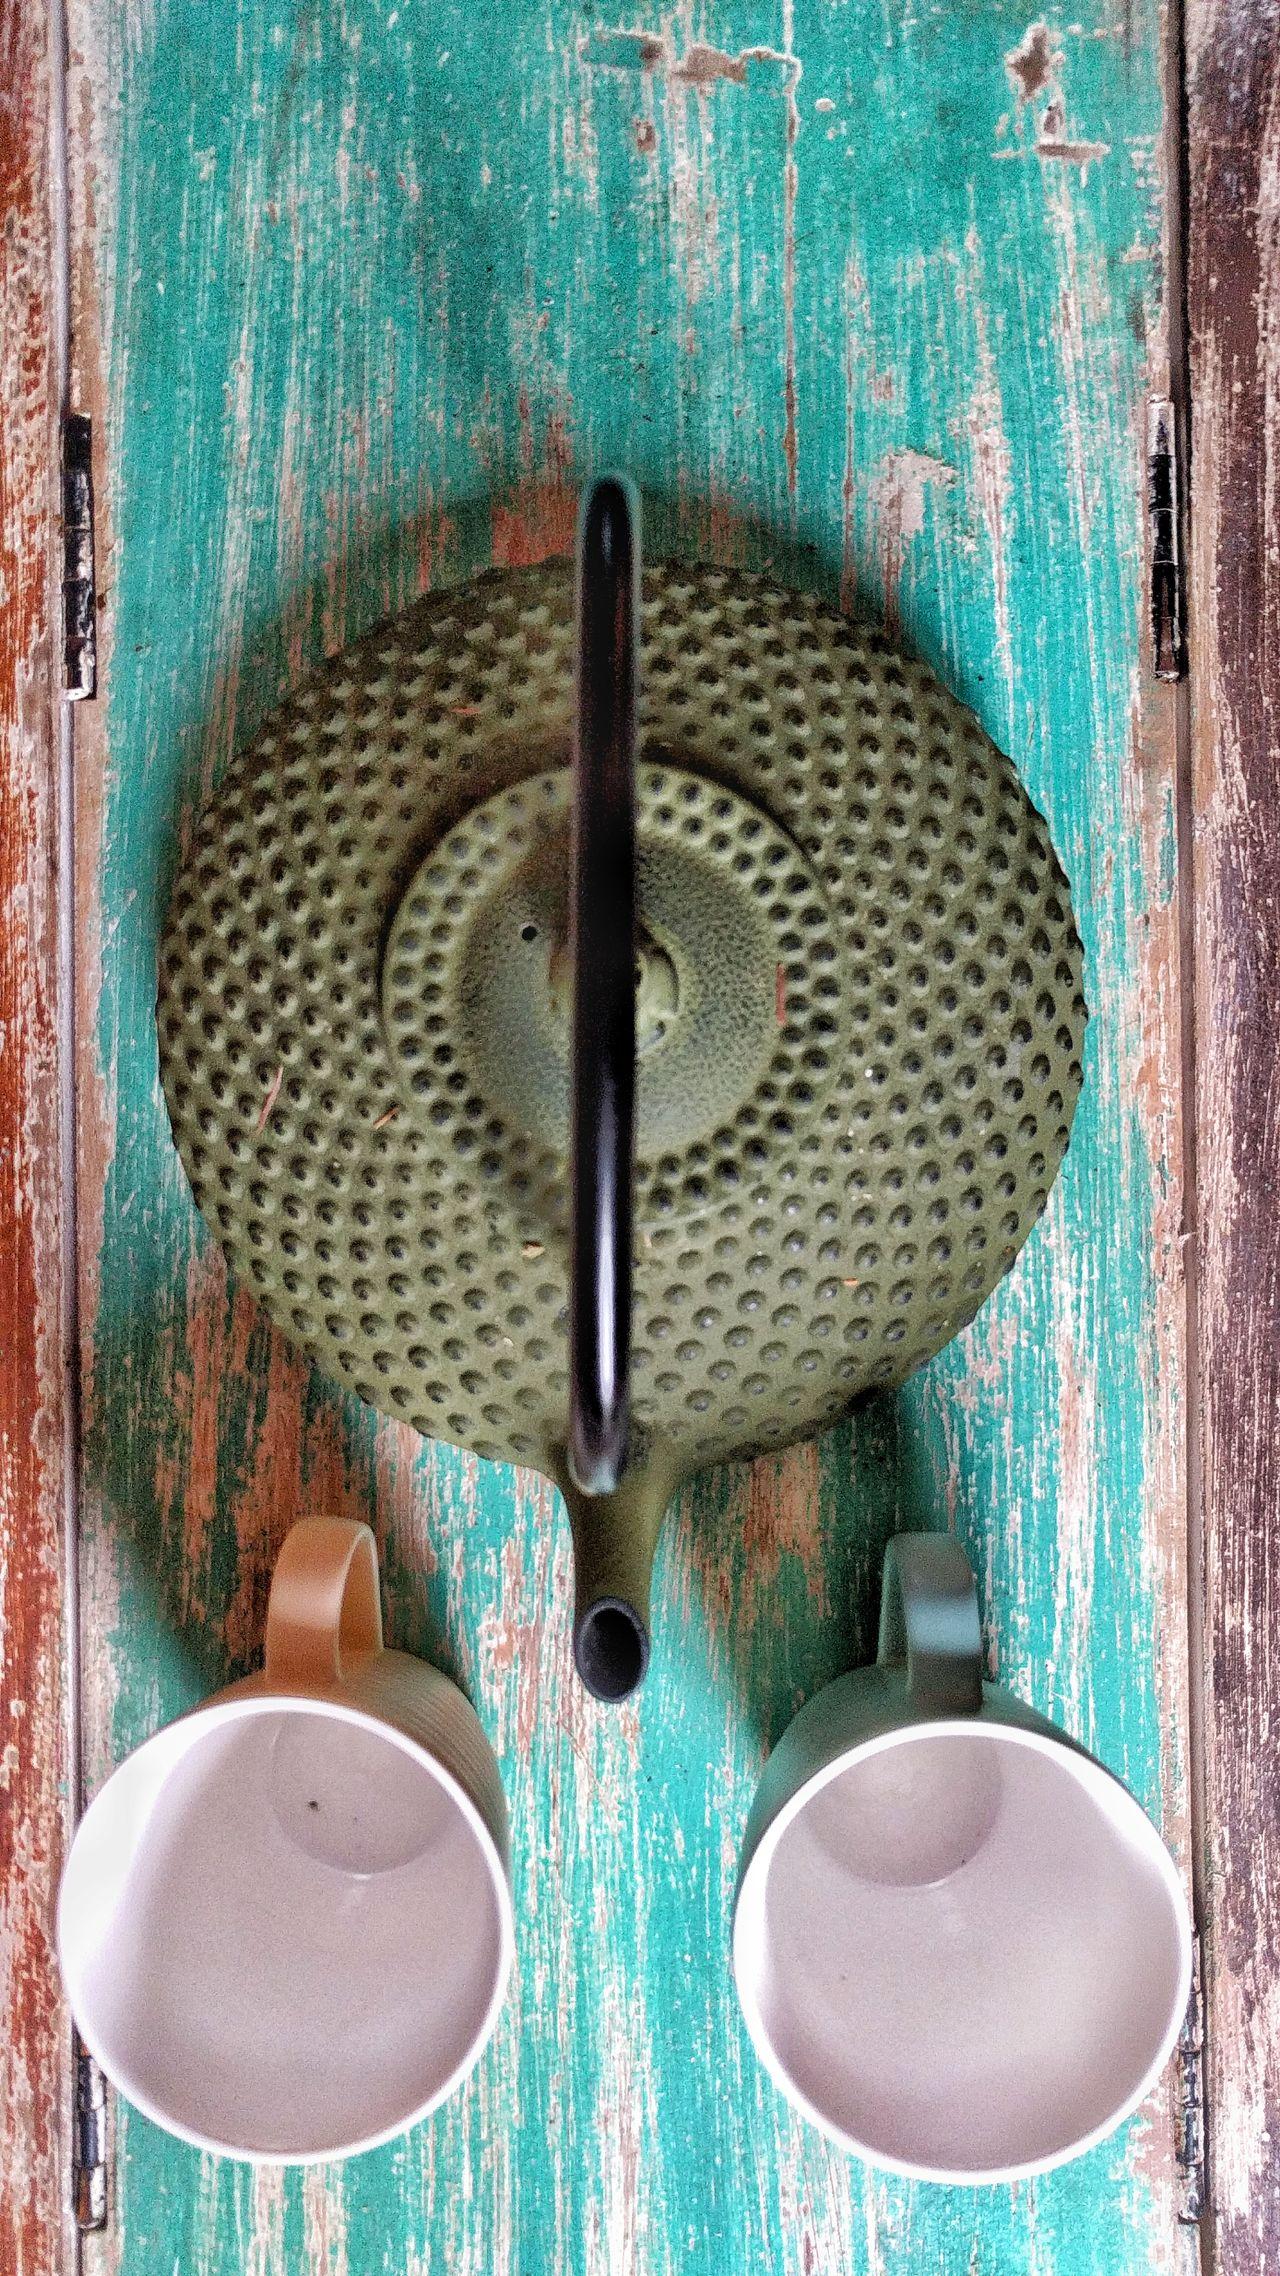 Tea Time Tea Teapot Tea Ceremony Refreshment Relaxing Textured  Close-up Indoors  Drink Mugs Tea Mug Welness Herb Tea Lieblingsteil